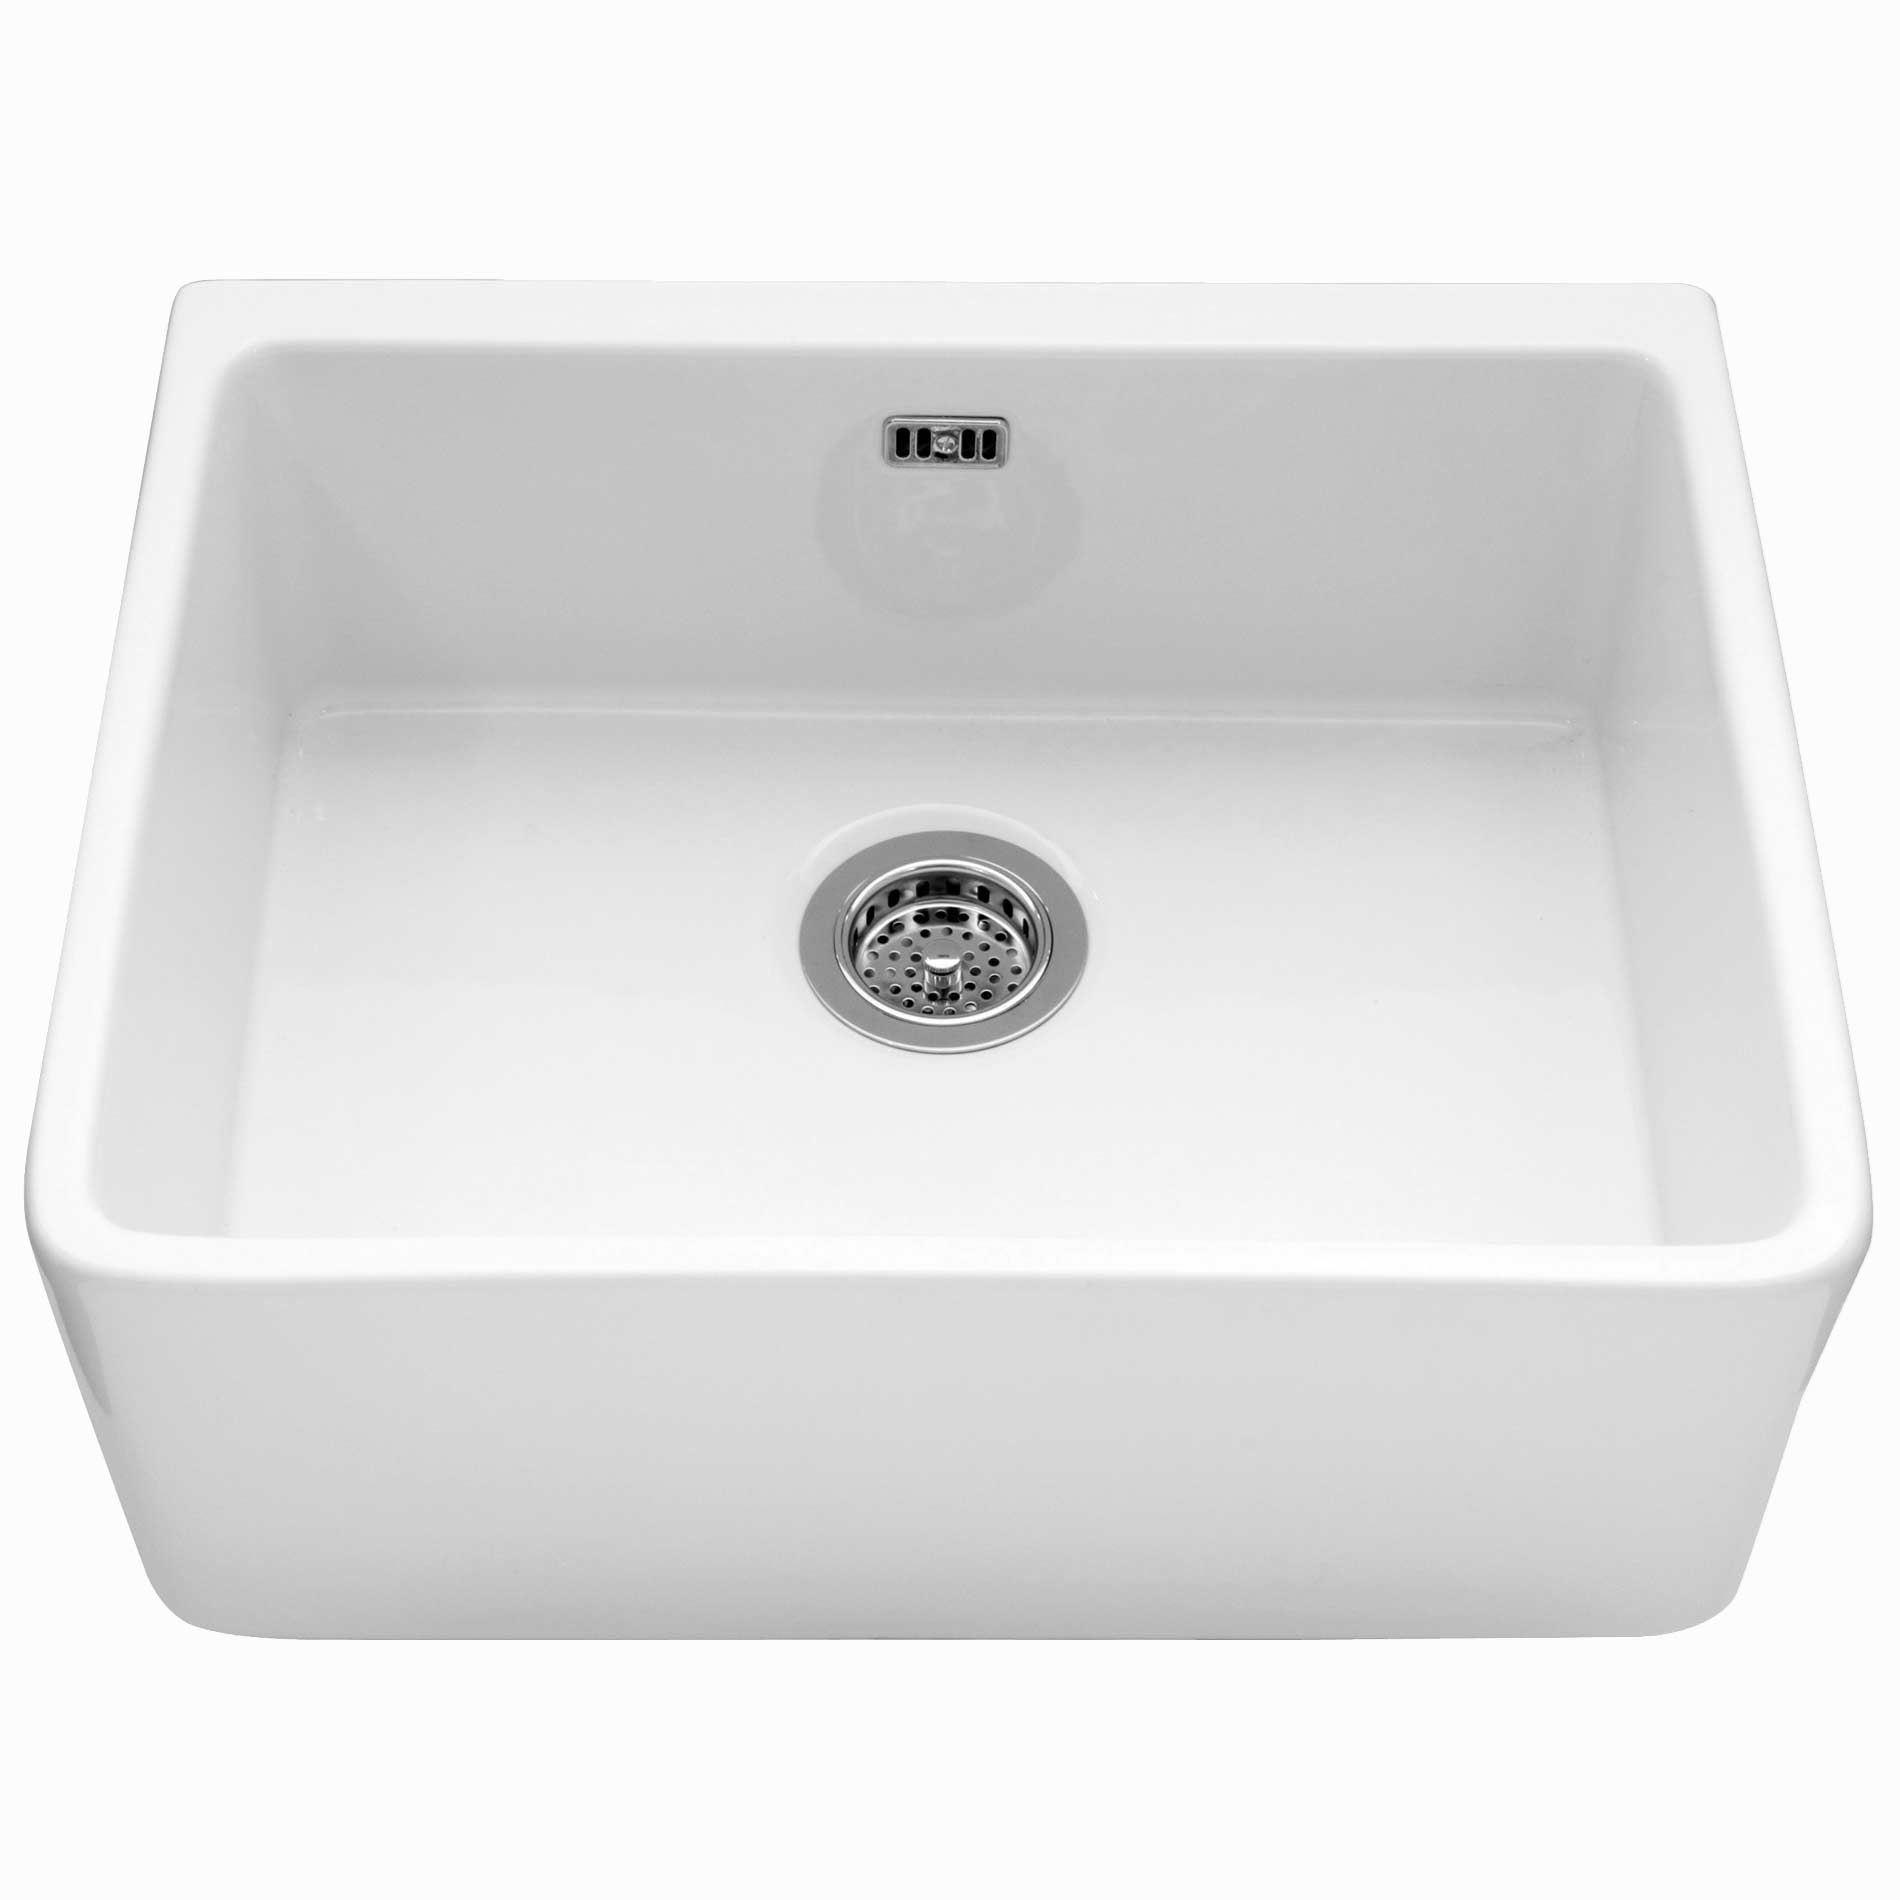 Caple Yorkshire Ceramic Single Bowl Sink Kitchen Sinks Taps